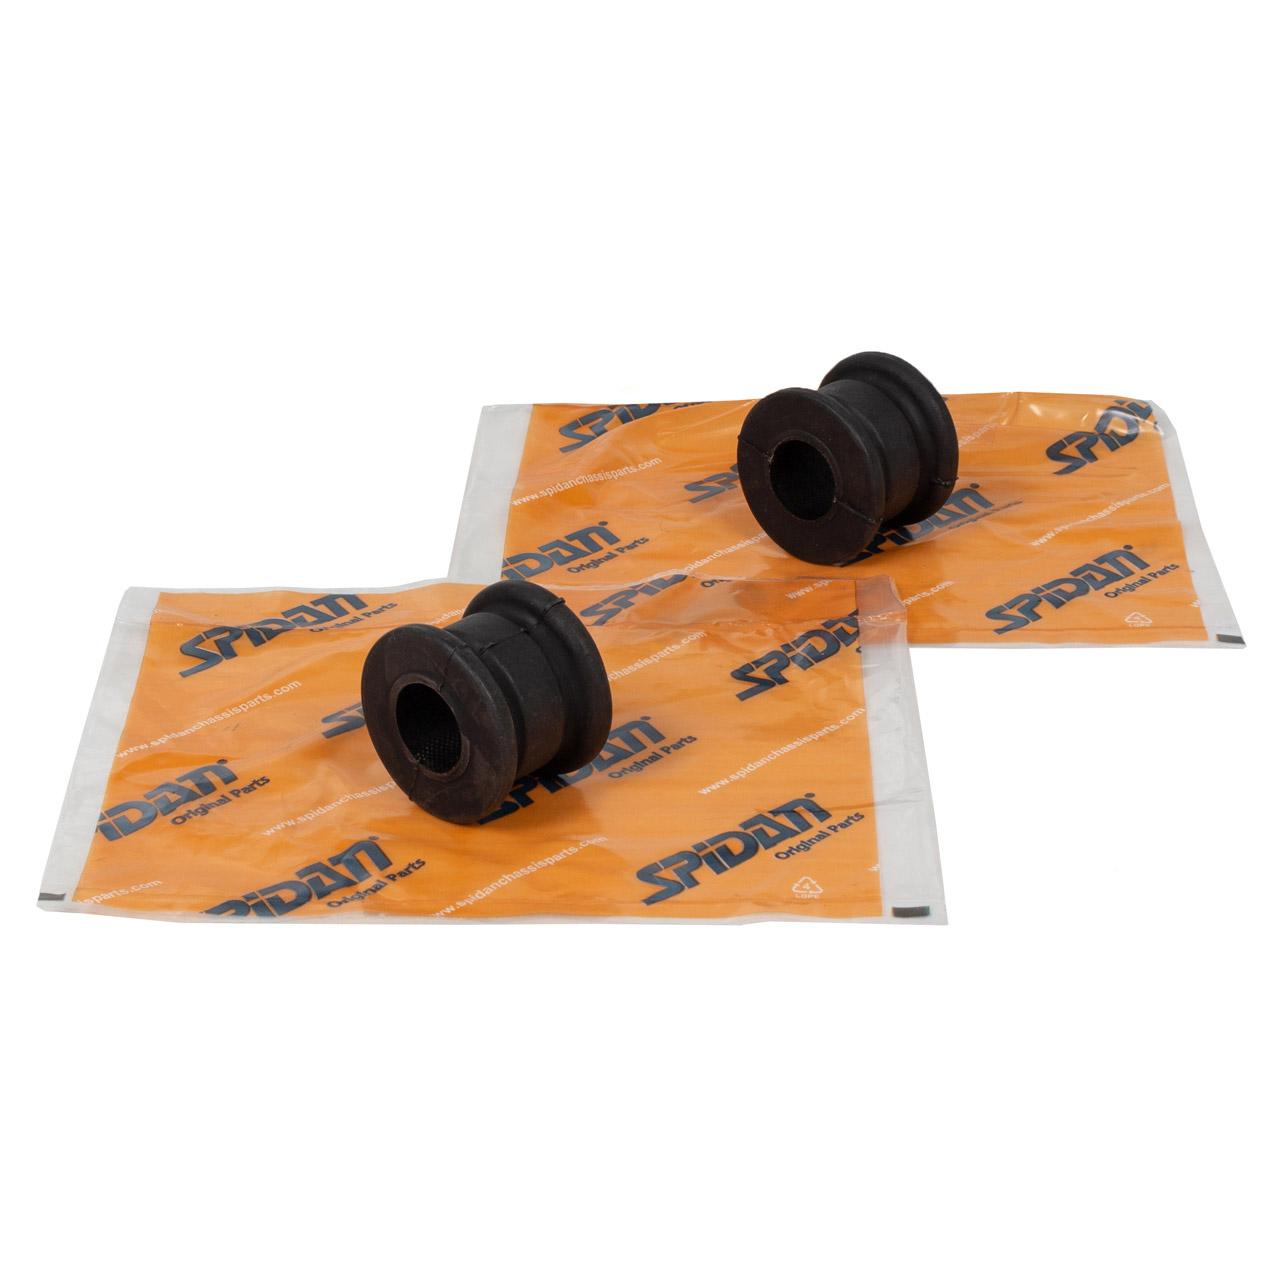 2x SPIDAN Stabilisatorlager MERCEDES W124 200-500 E 200-300 D/Turbo-D vorne 1243232785